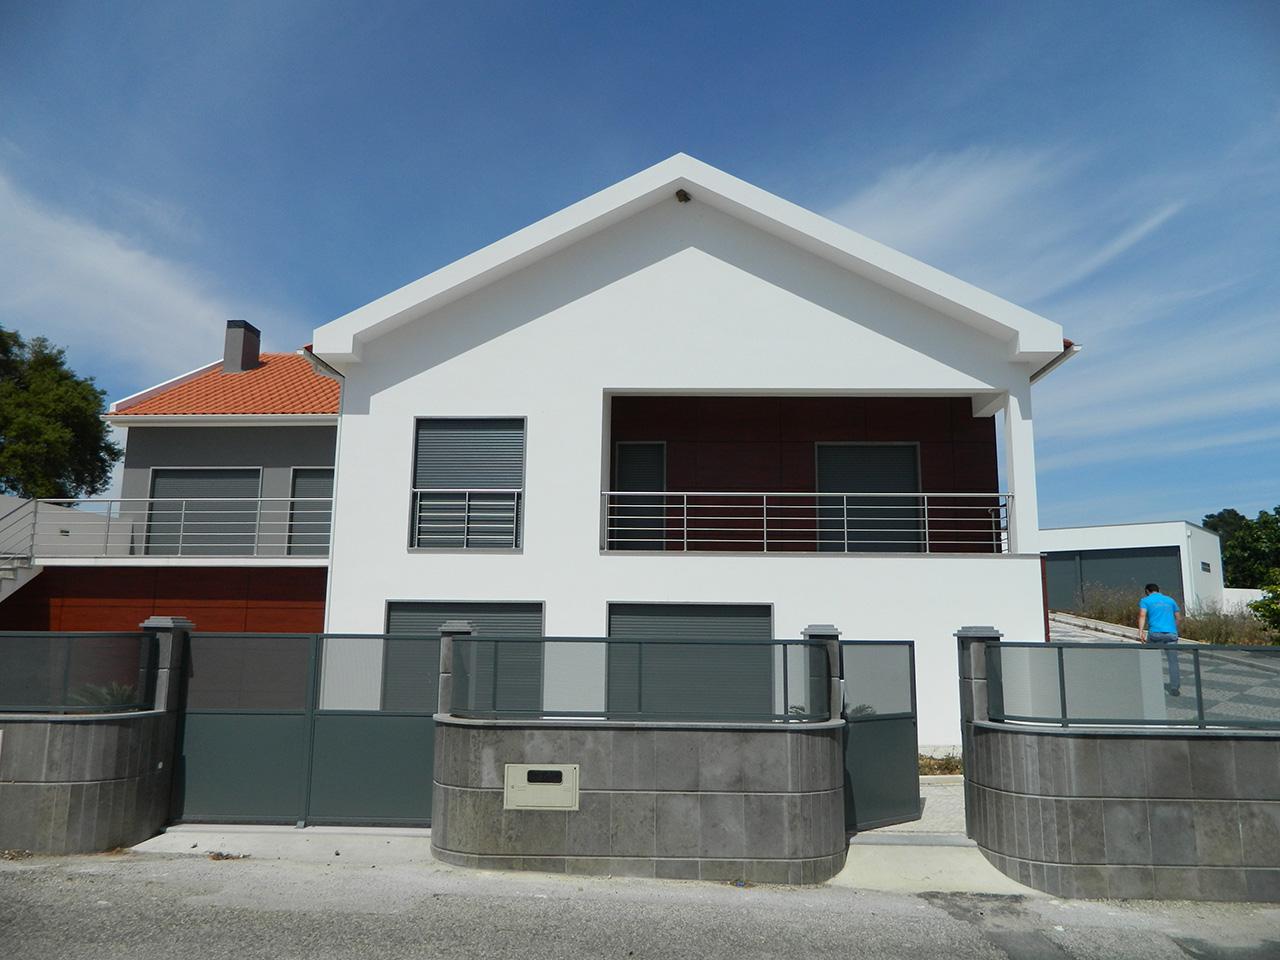 Single Family House Reconstruction – Rio Maior